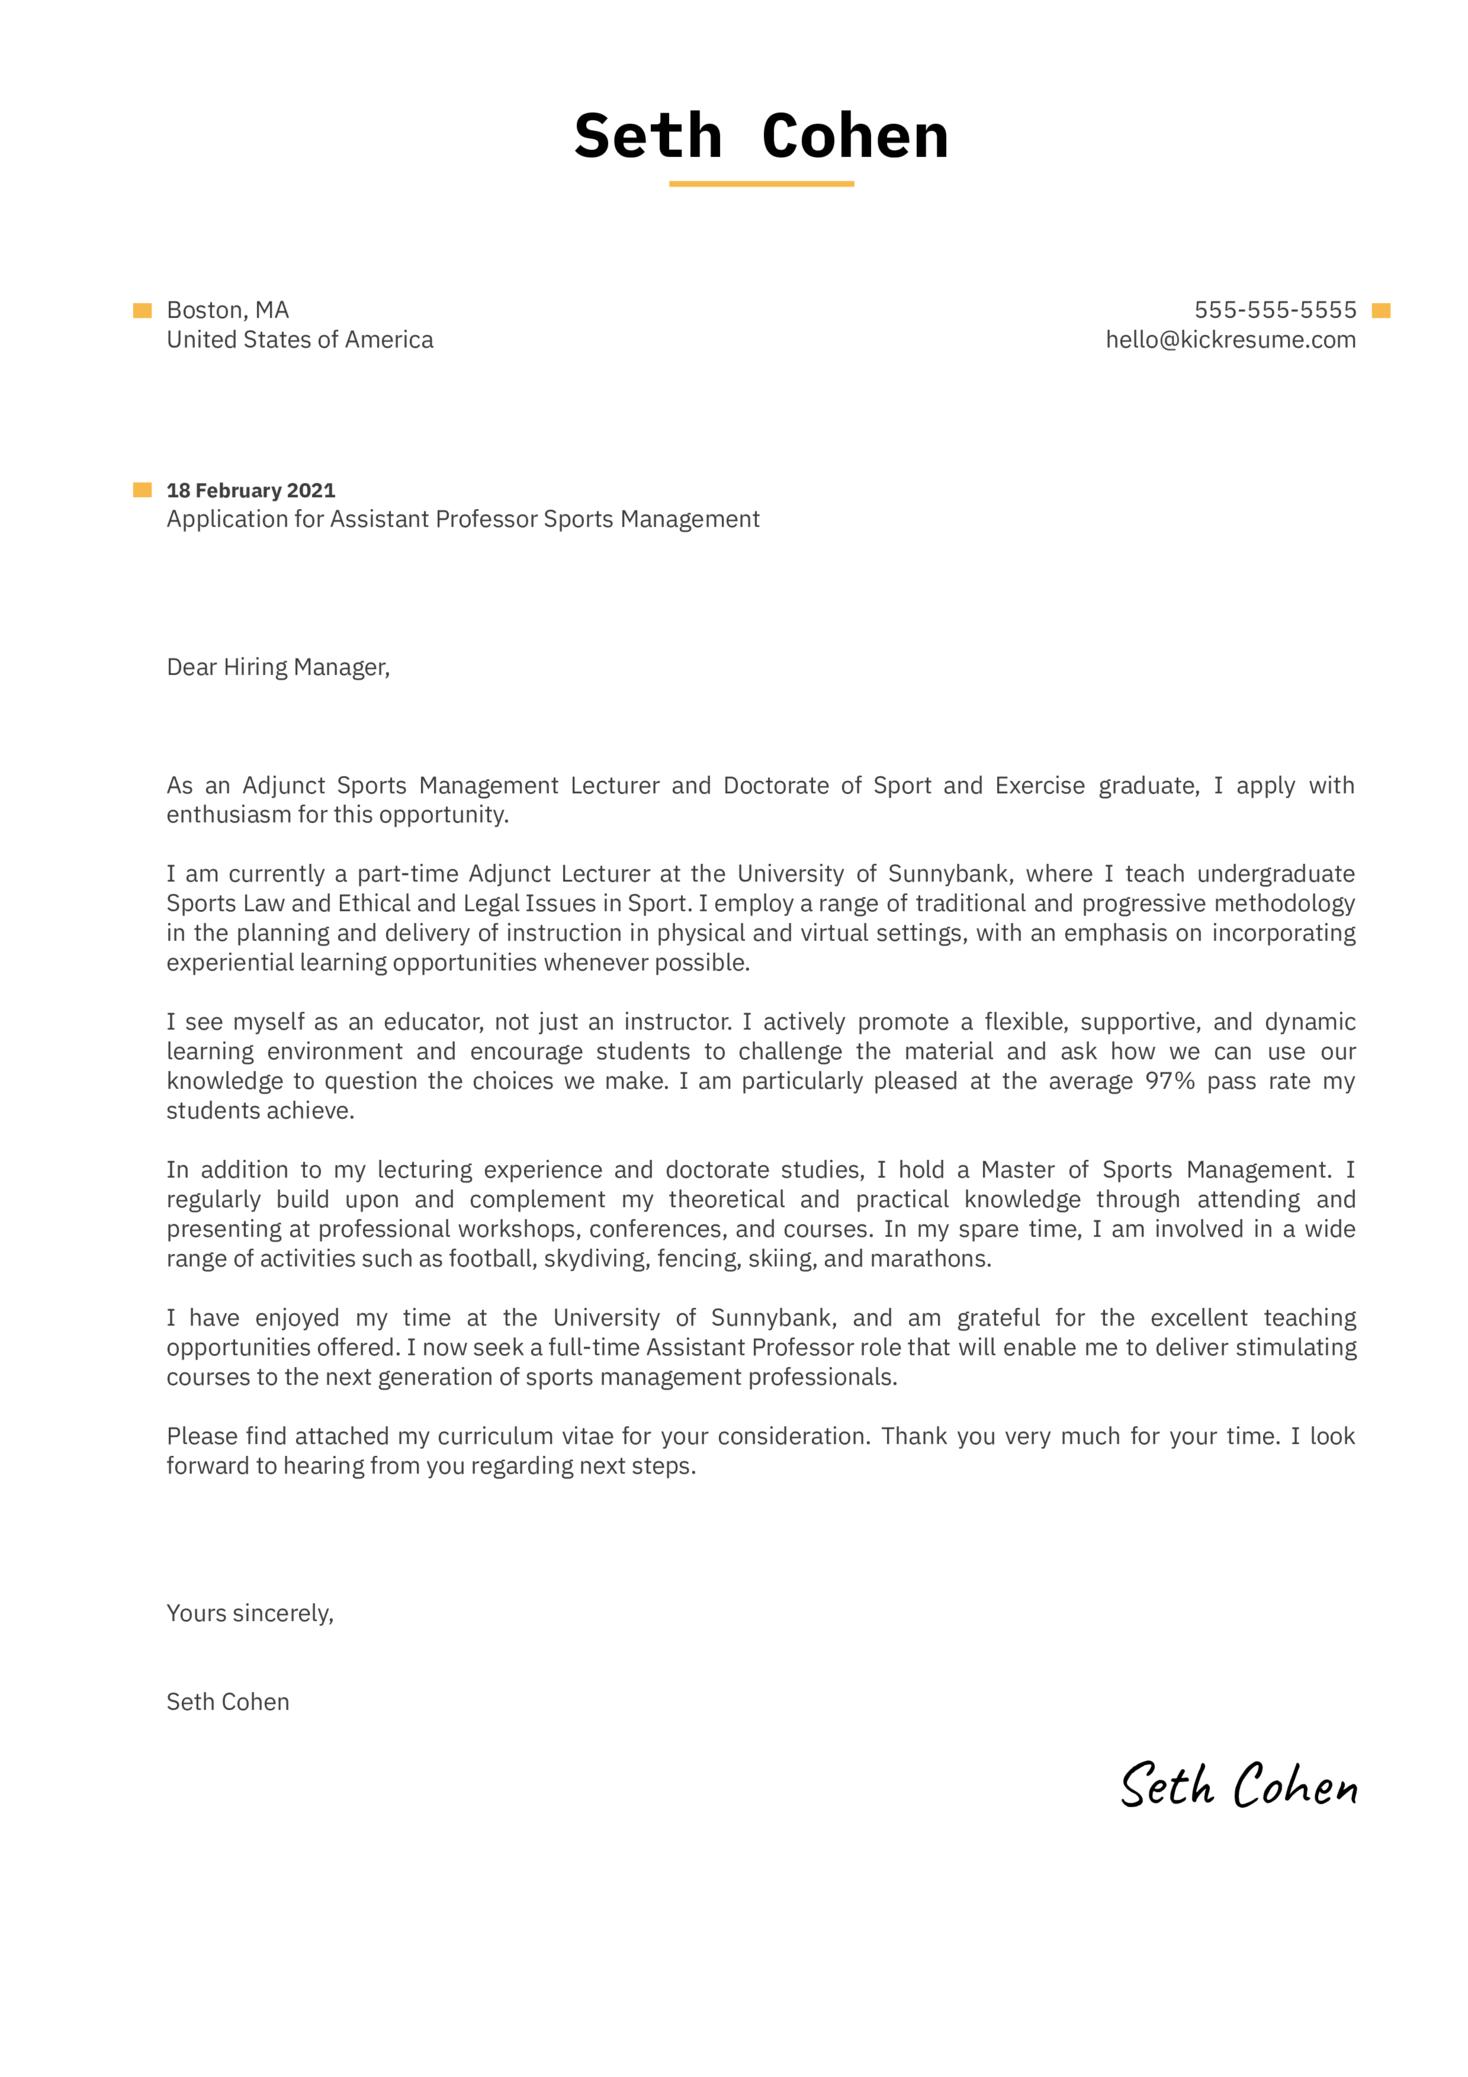 Assistant Professor Sports Management Cover Letter Sample